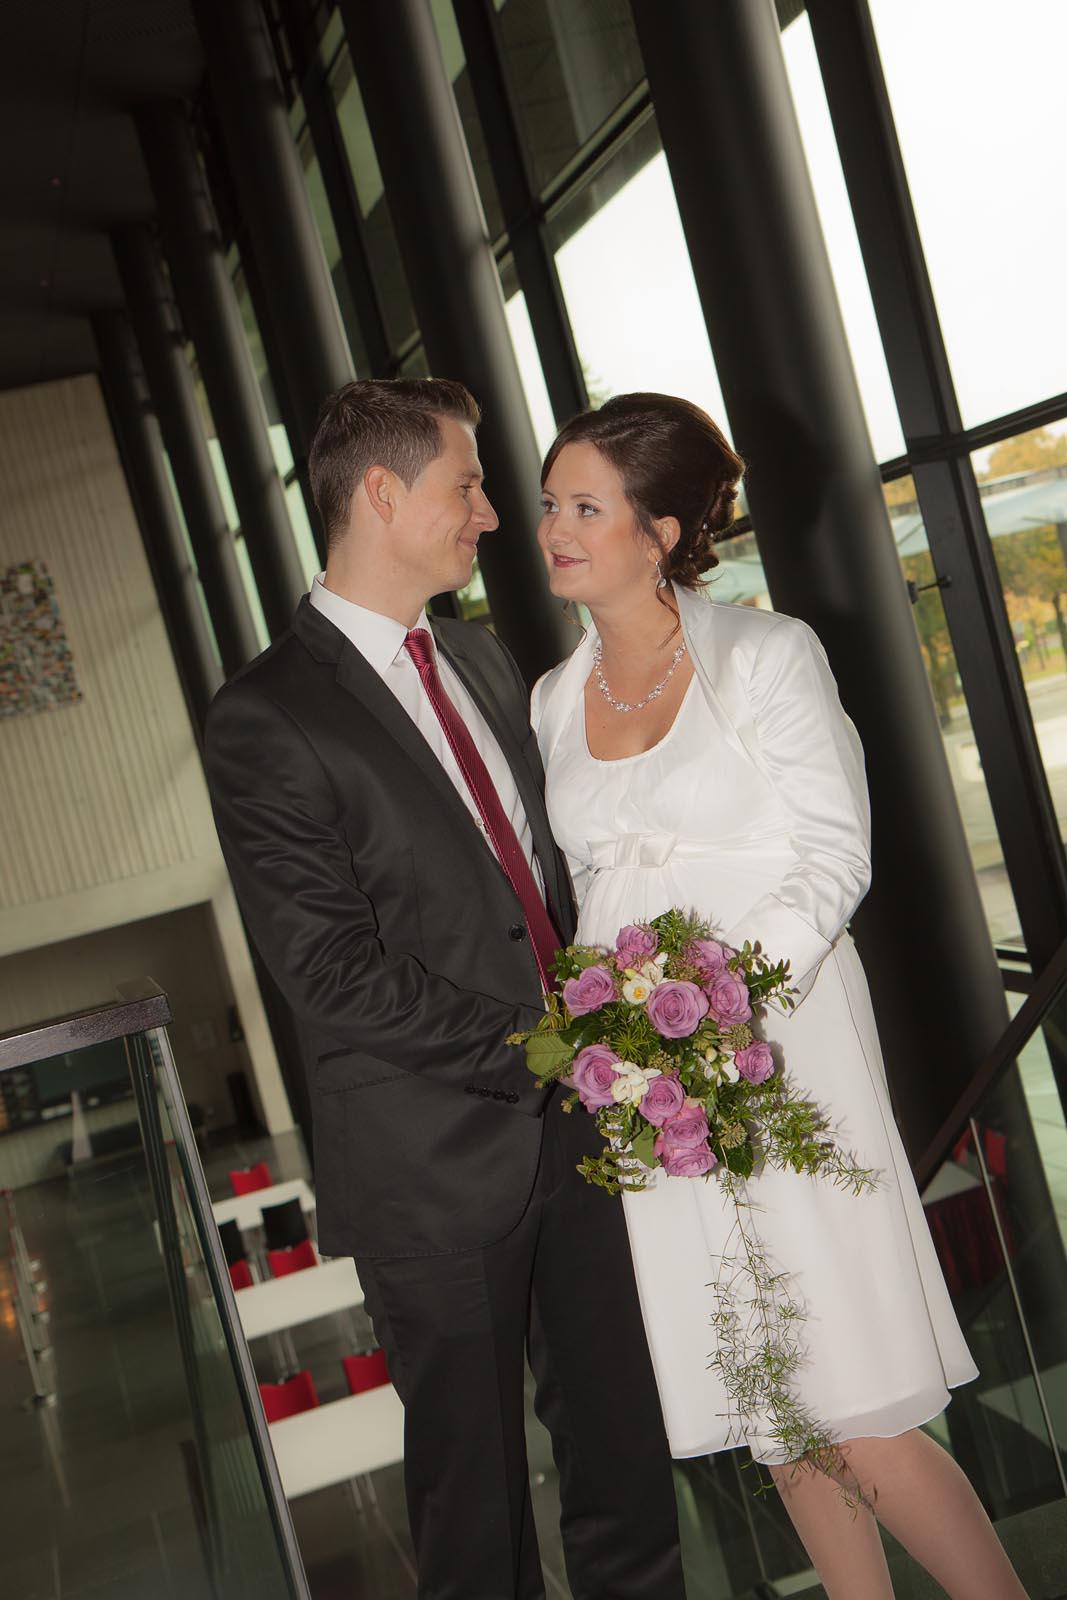 Hochzeit-Fleischmann-Hochzeit-Fleischmann-0356.jpg